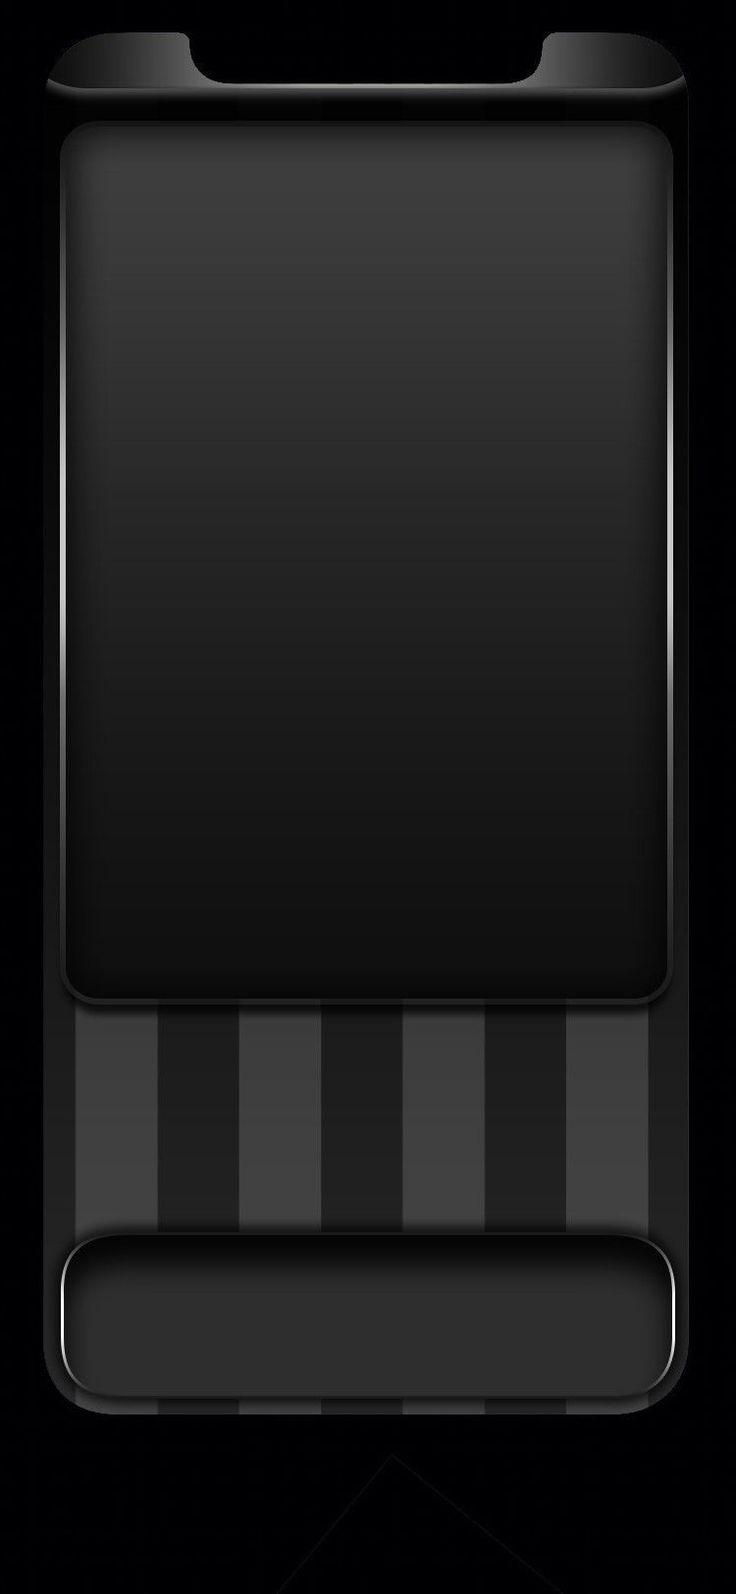 Iphone X Xr Xs Xs Max Wallpaper Ios 13 Dark Mode Ios13wallpaper Dark Black Wallpaper For Dark Black Wallpaper Top Iphone Wallpapers Black Wallpaper Iphone